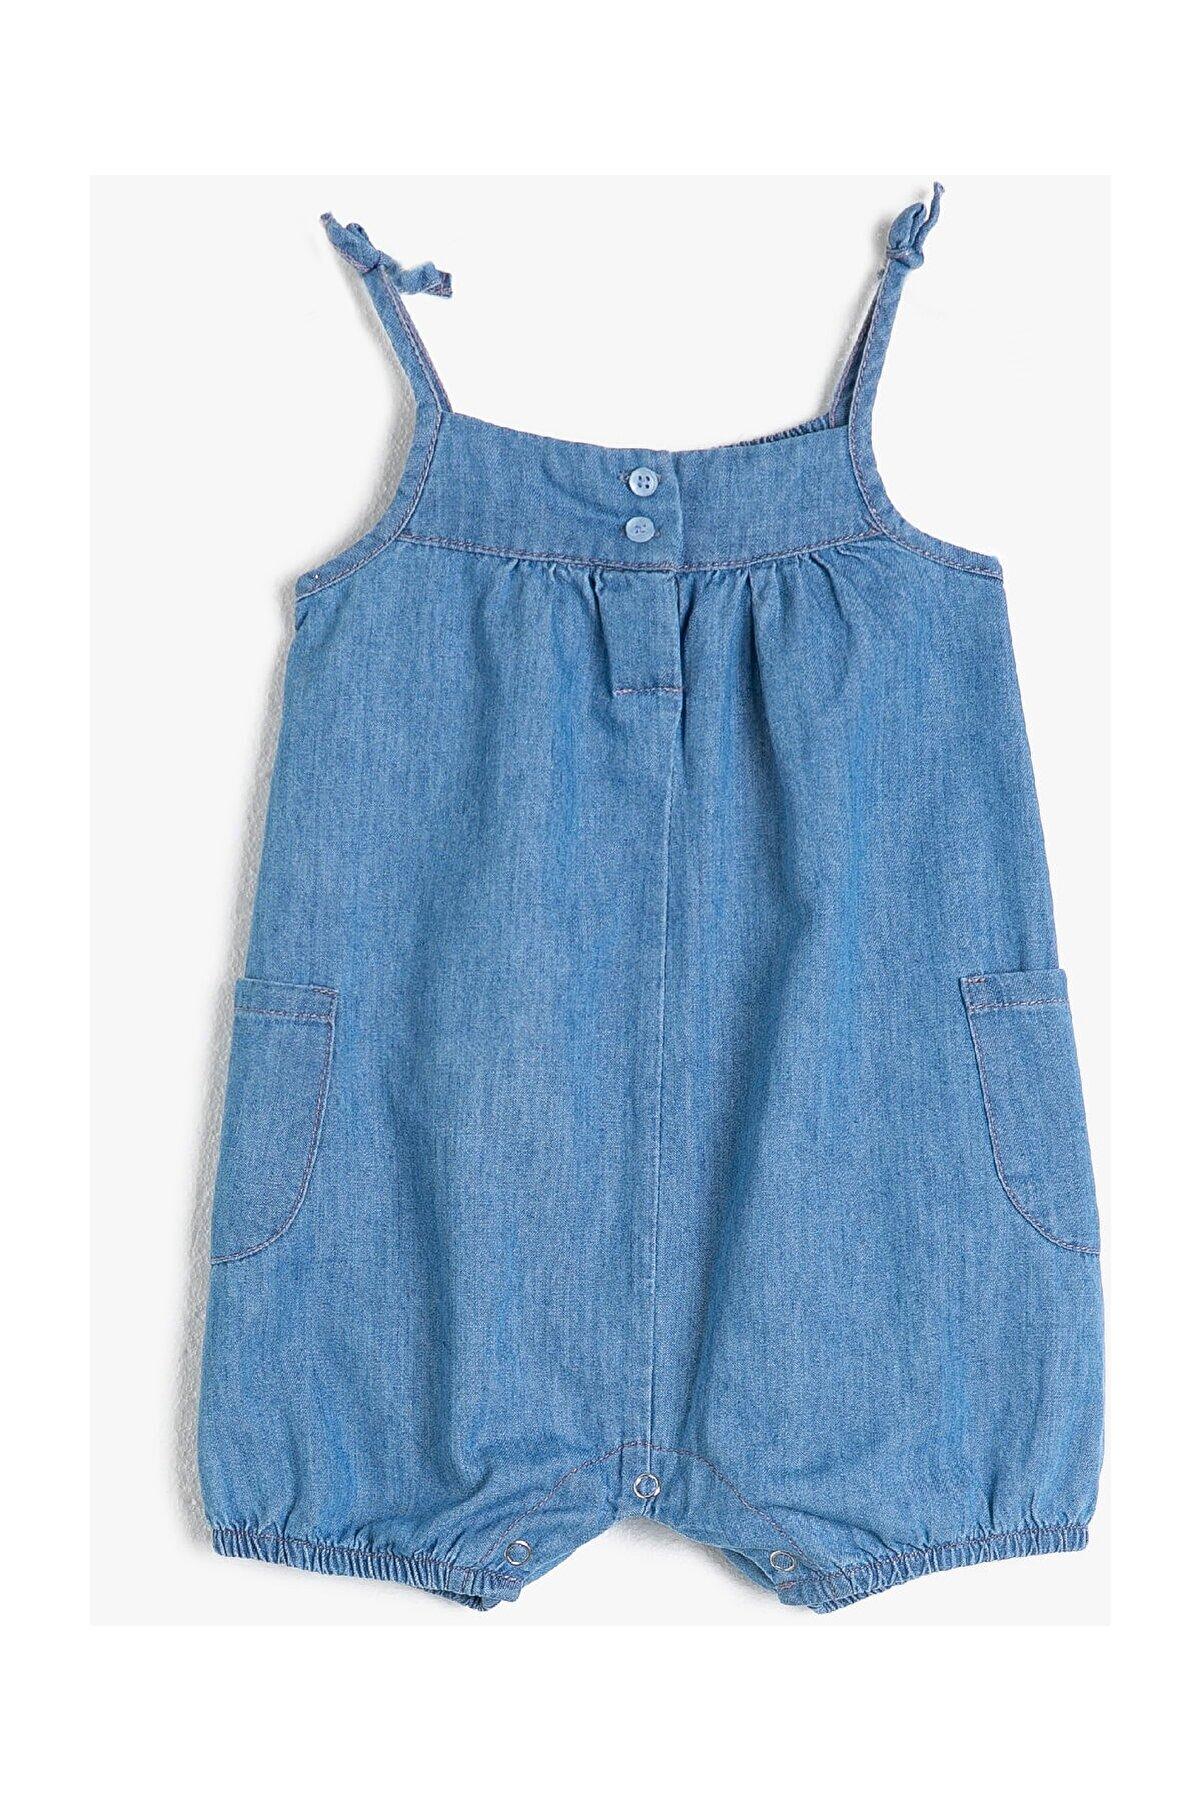 Koton Mavi Kız Bebek Tulum